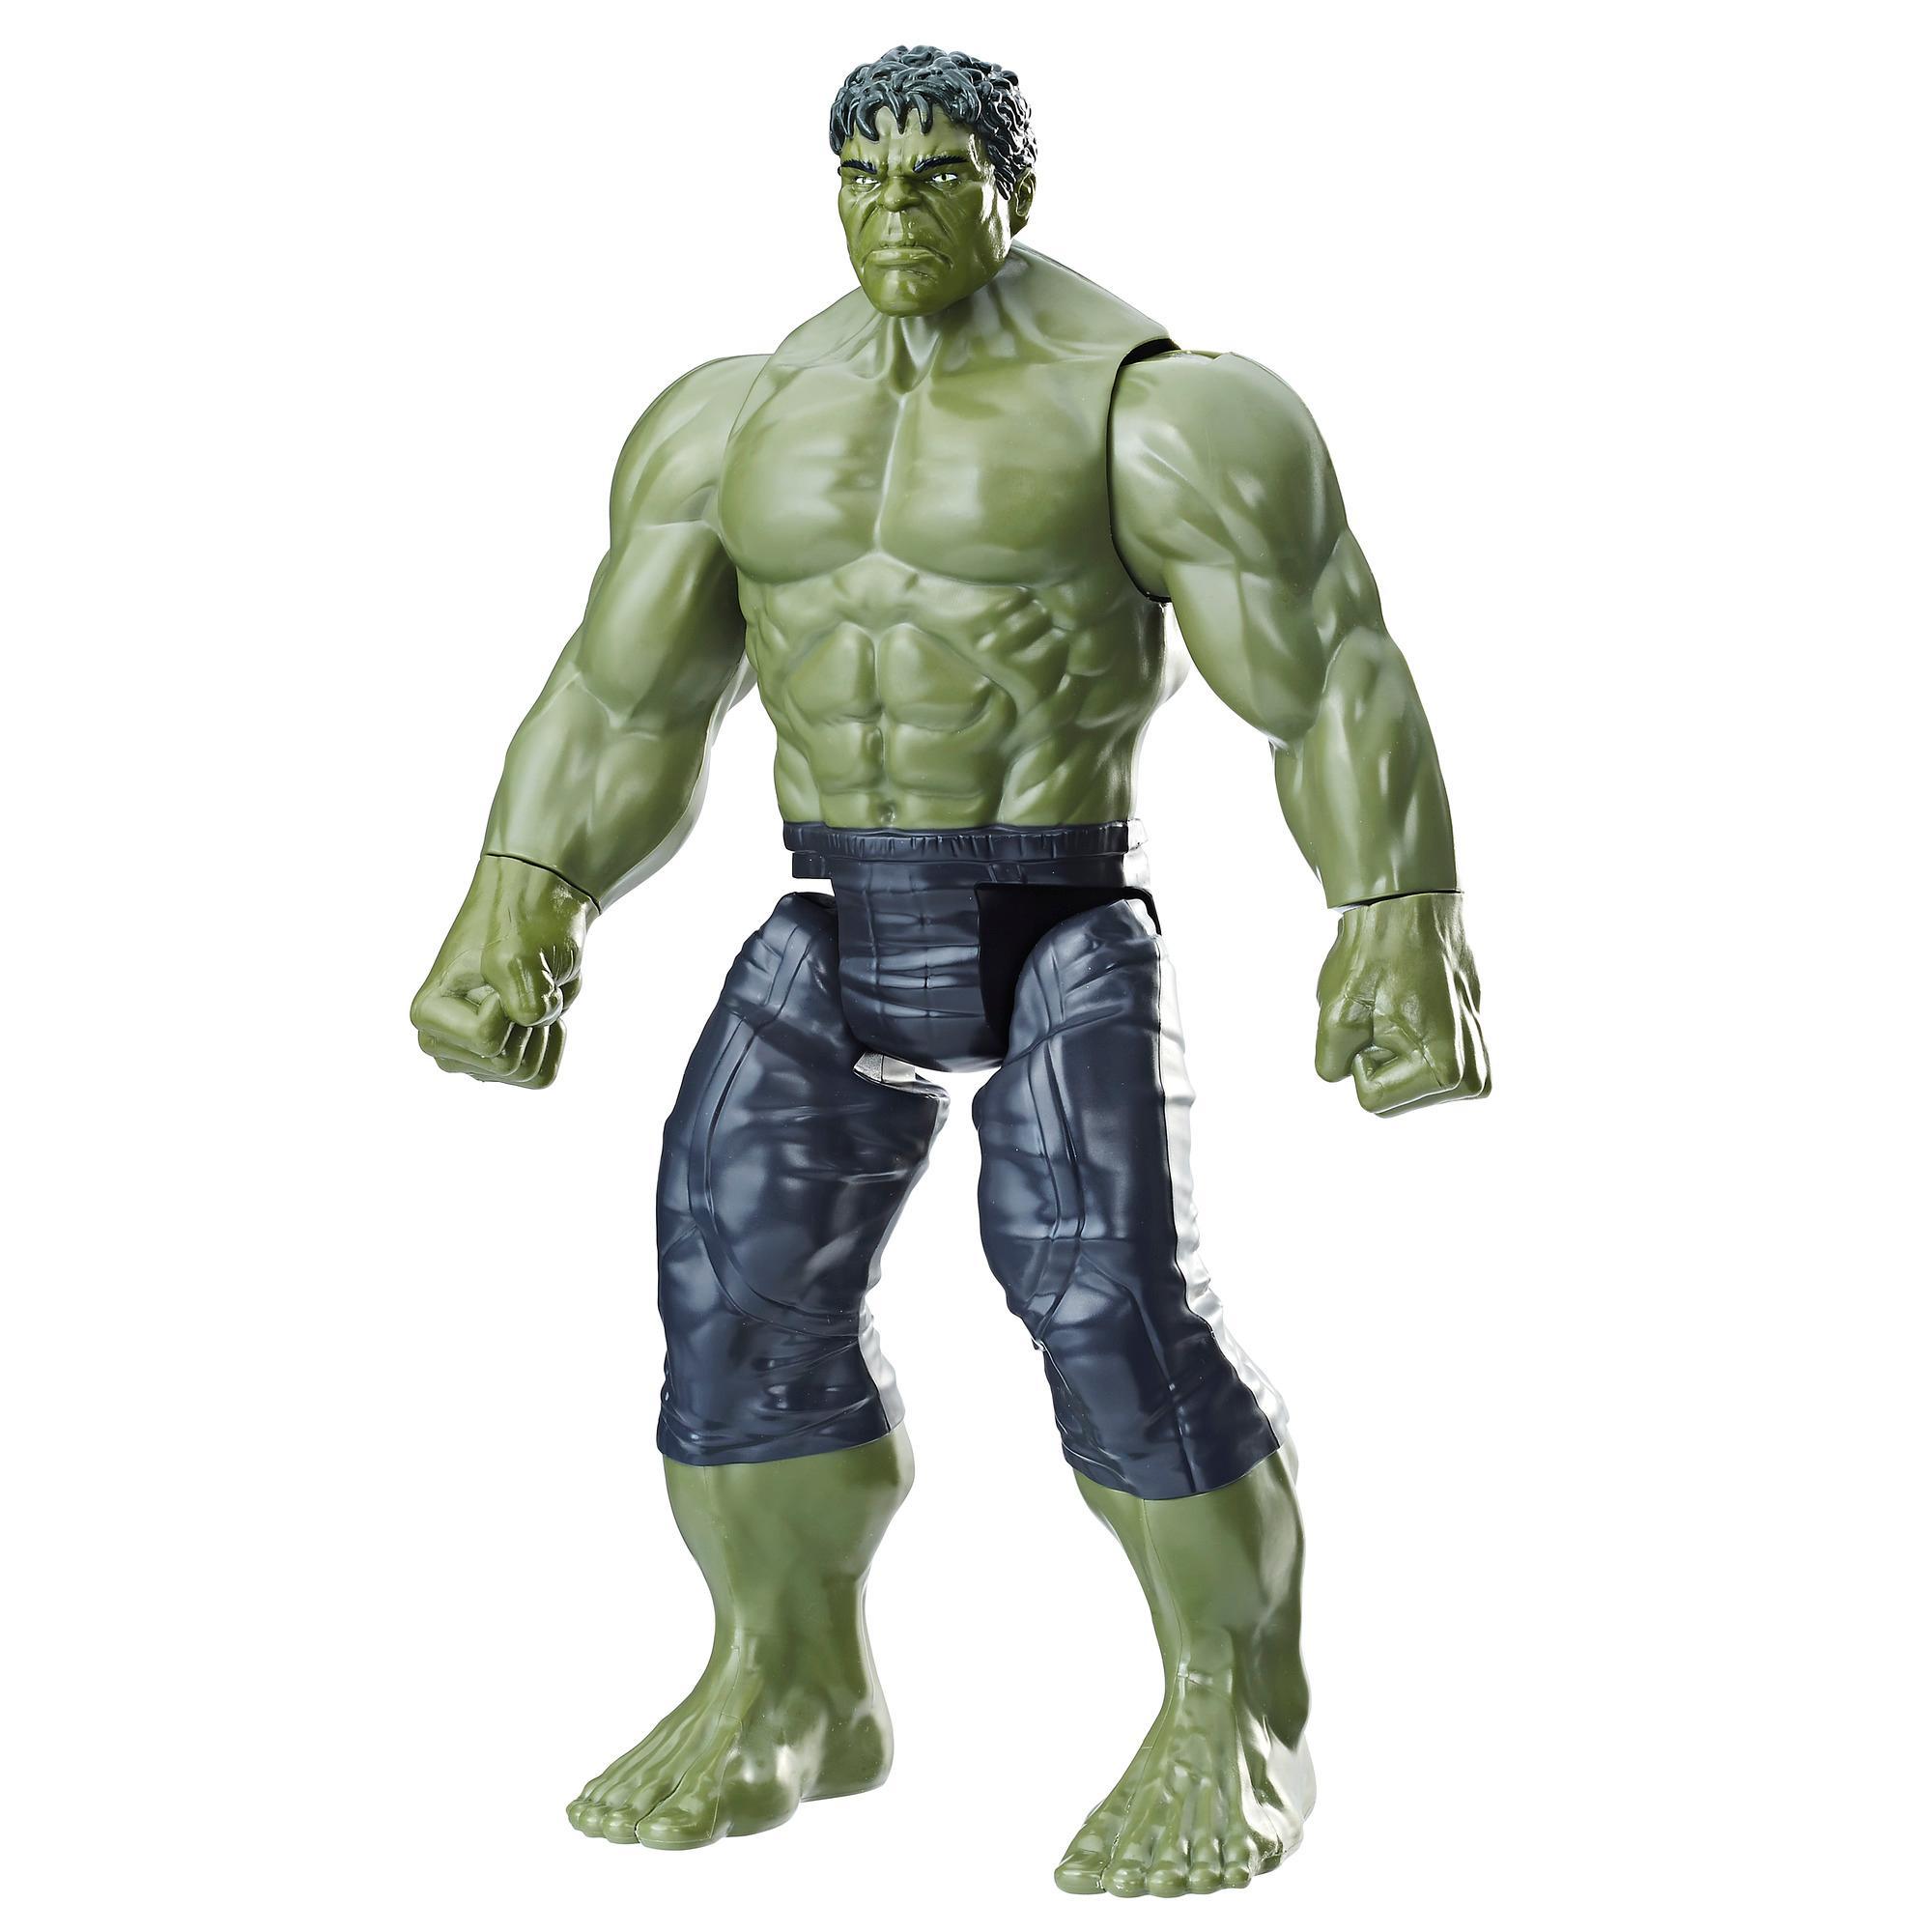 Marvel Infinity War Titan Hero Series Hulk with Titan Hero Power FX Port